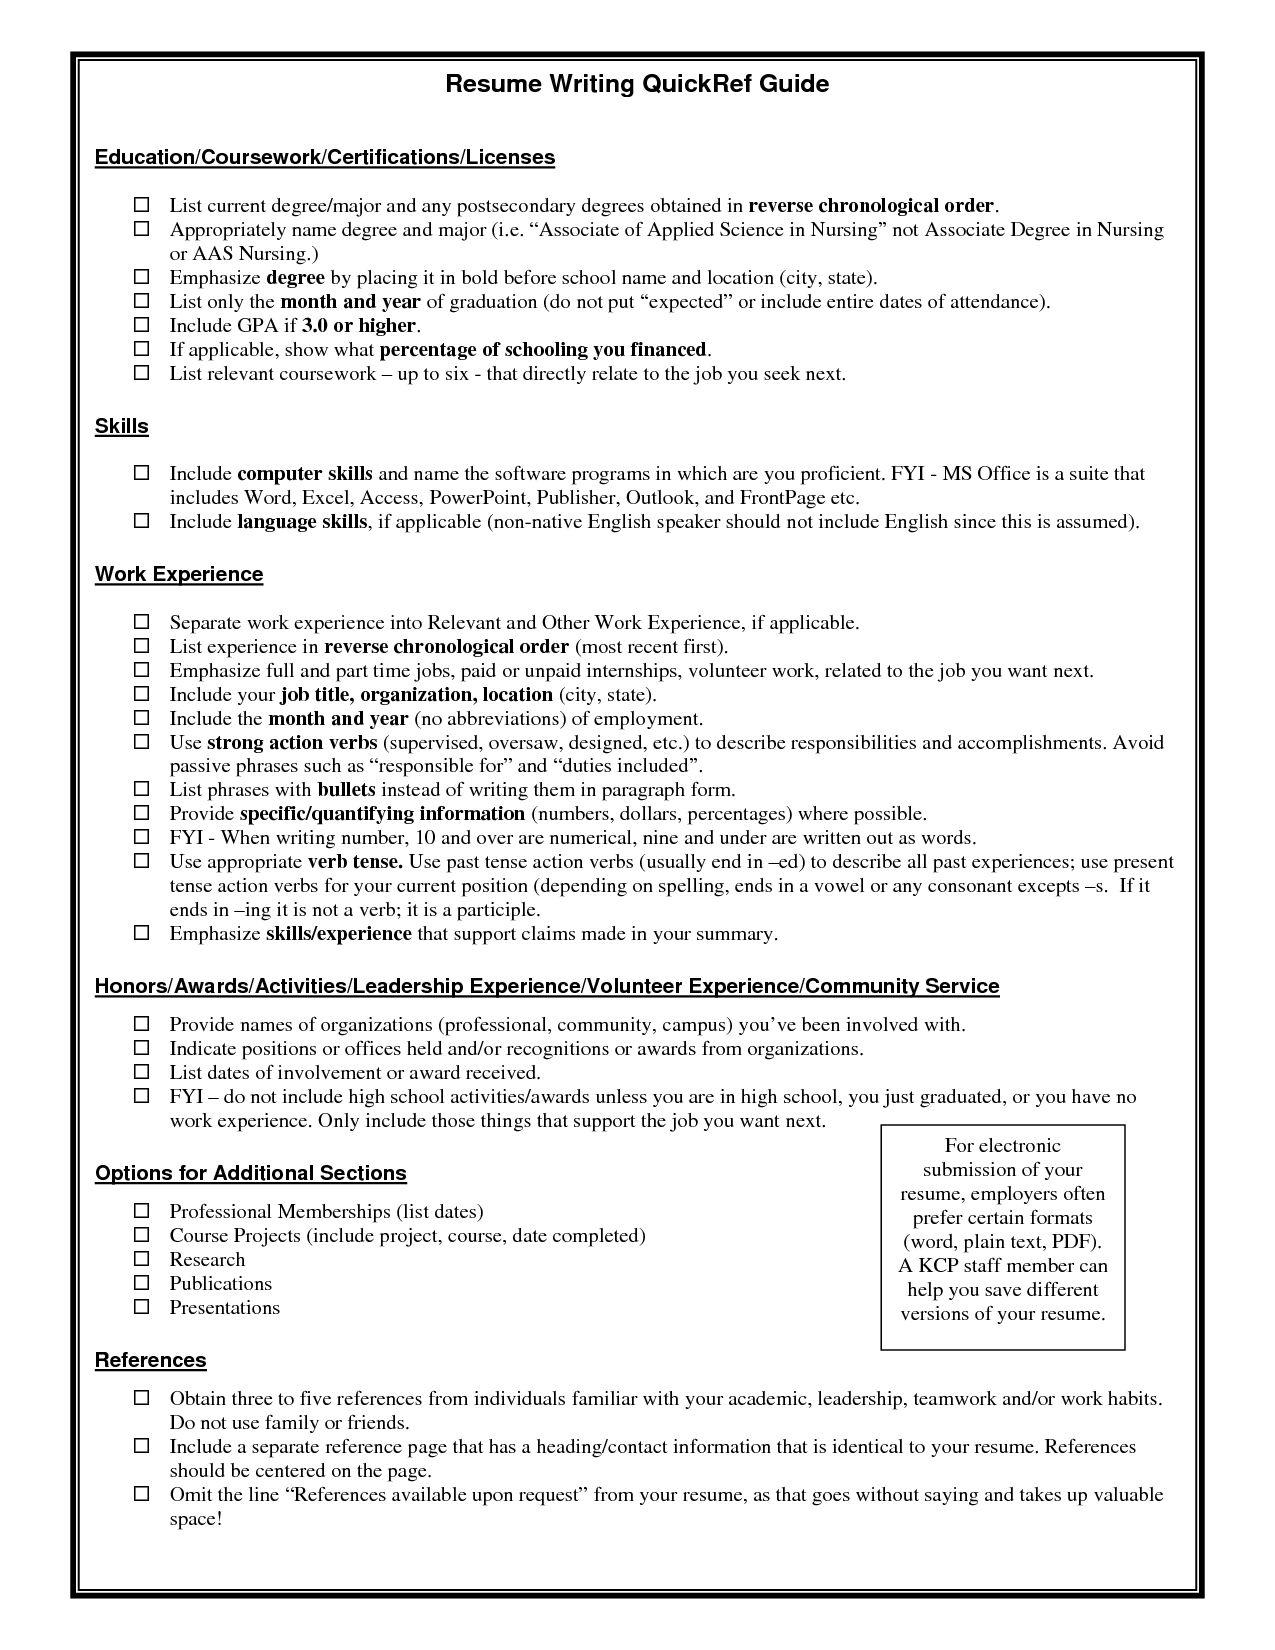 Resume Writing Certification Free